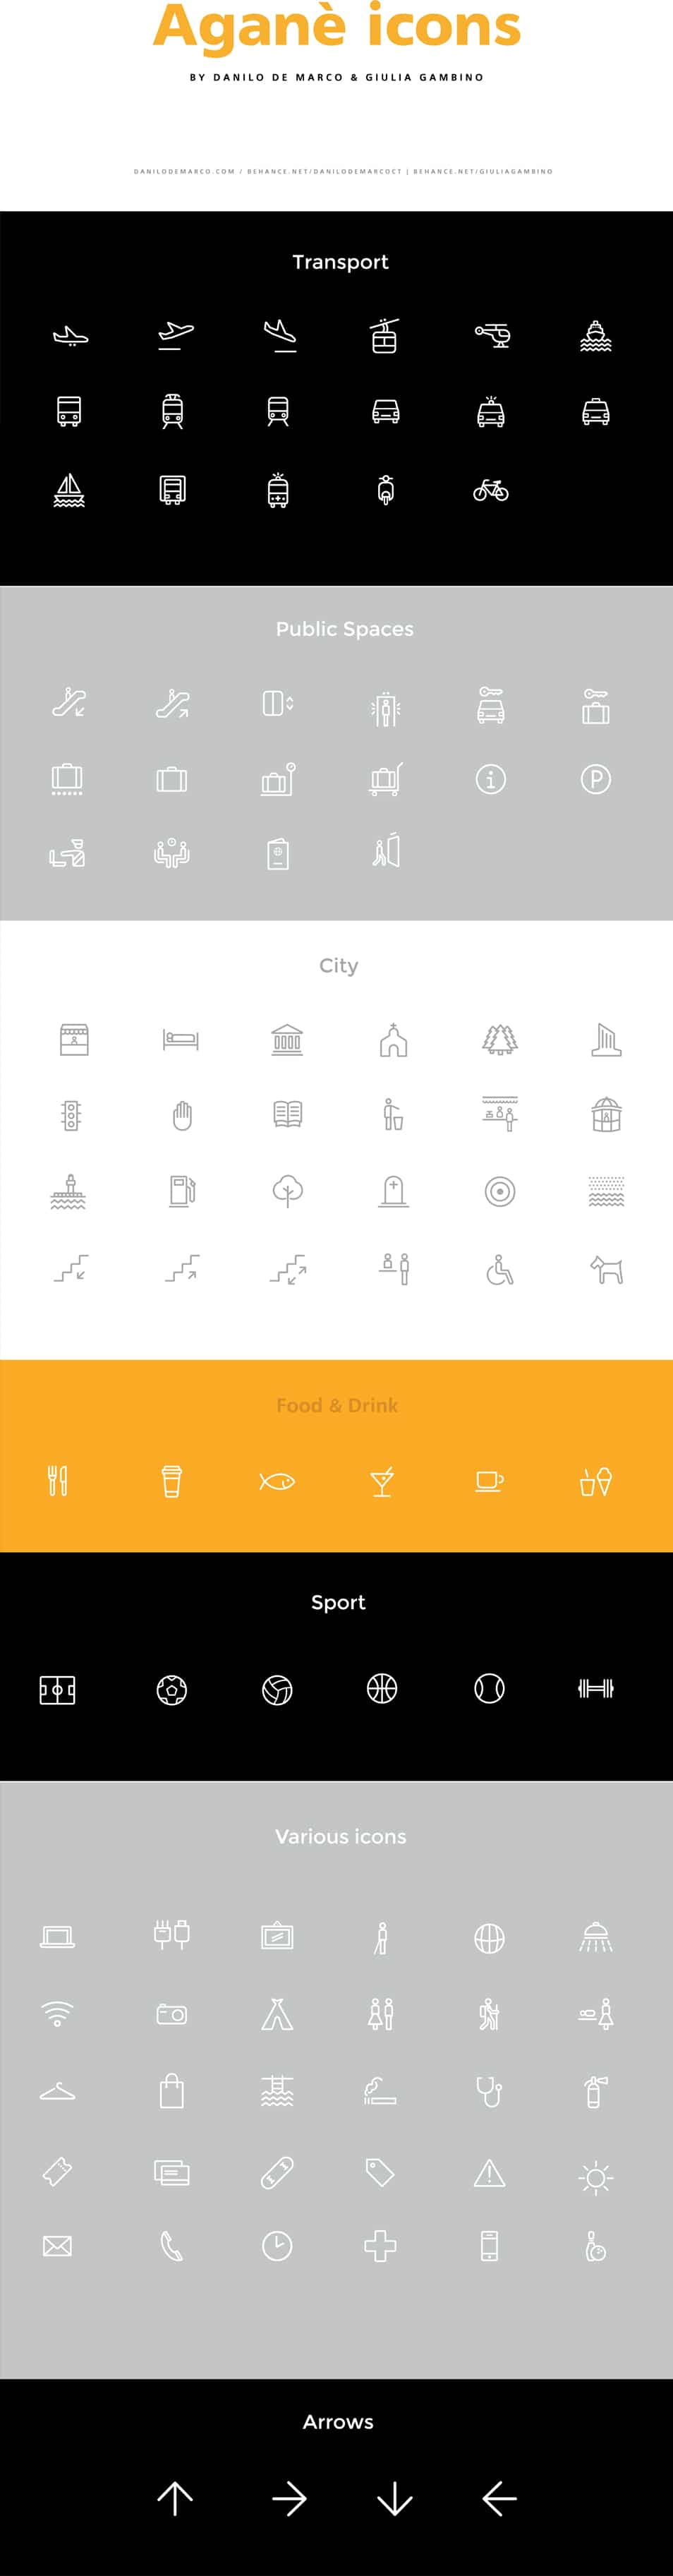 Agane icons free line icon set css author for Cssauthor